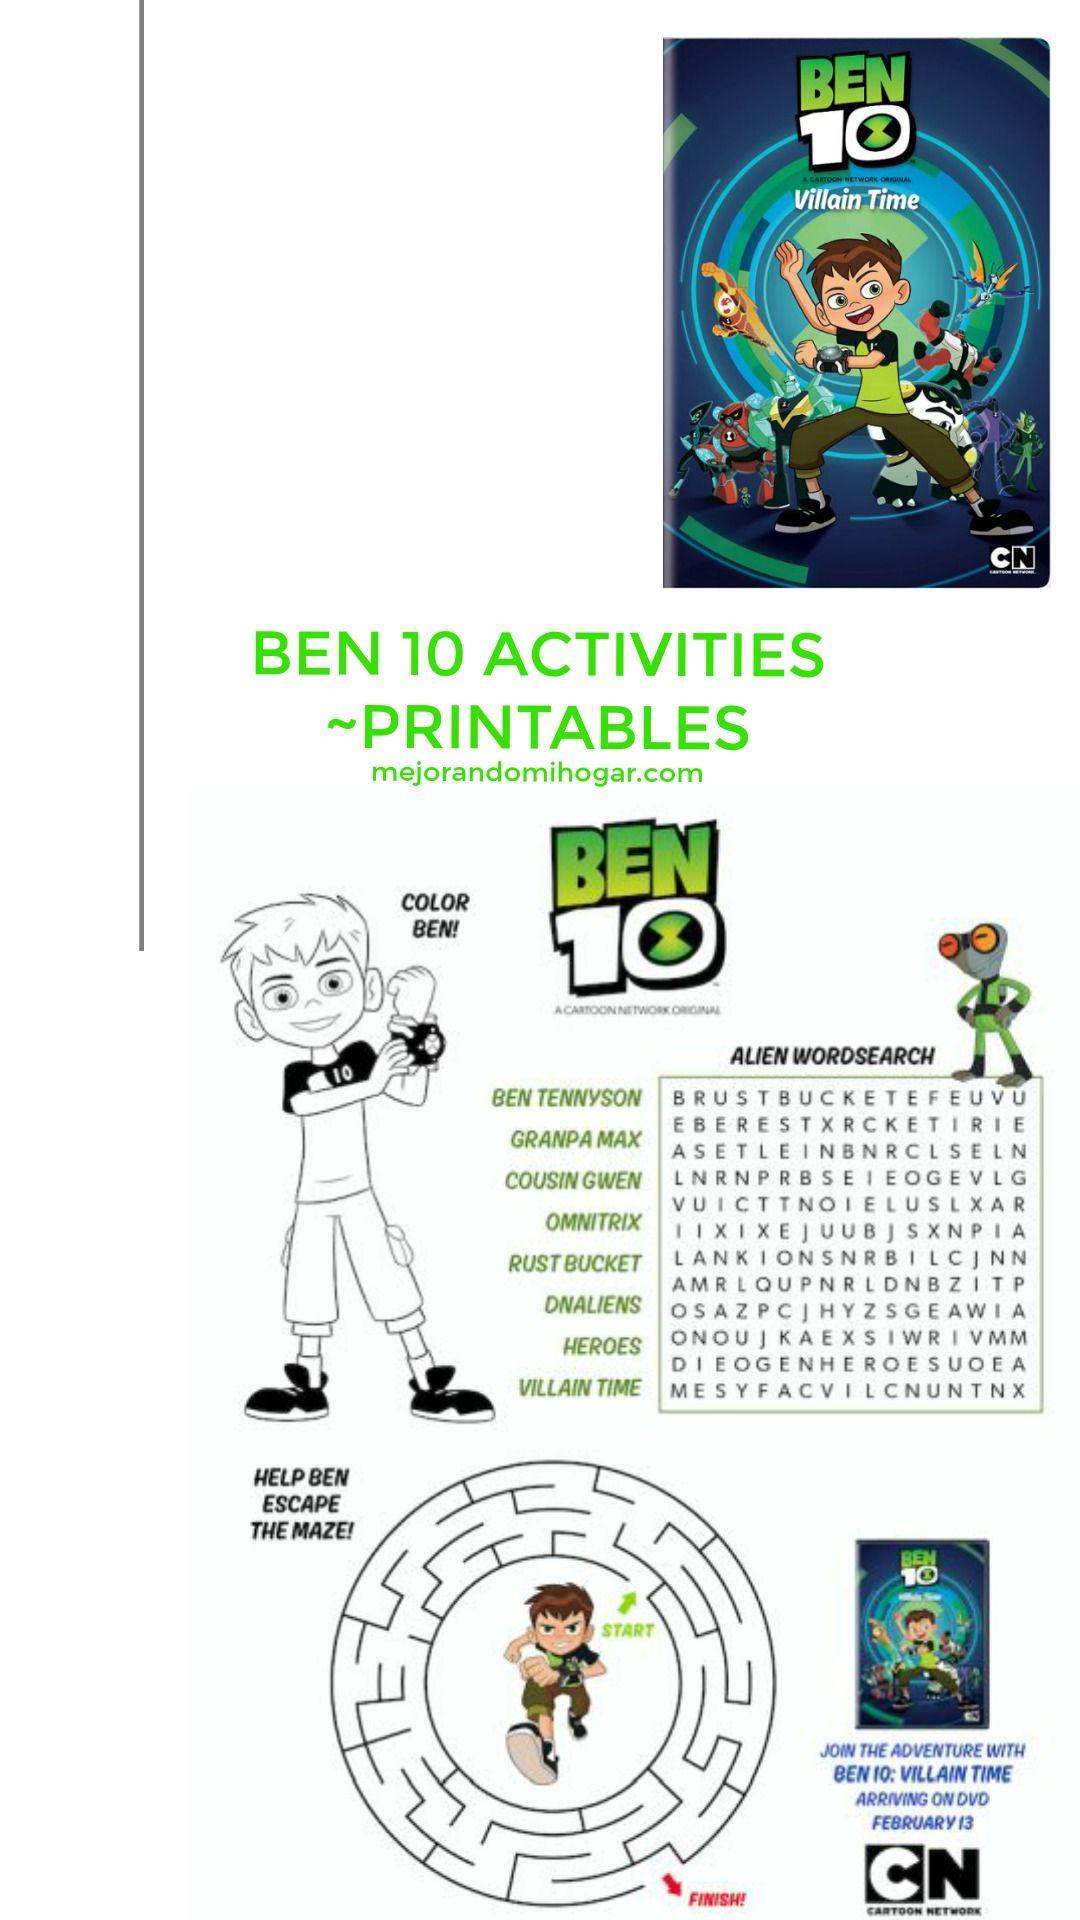 Ben 10 Villain Time Activities Actividades Imprimibles